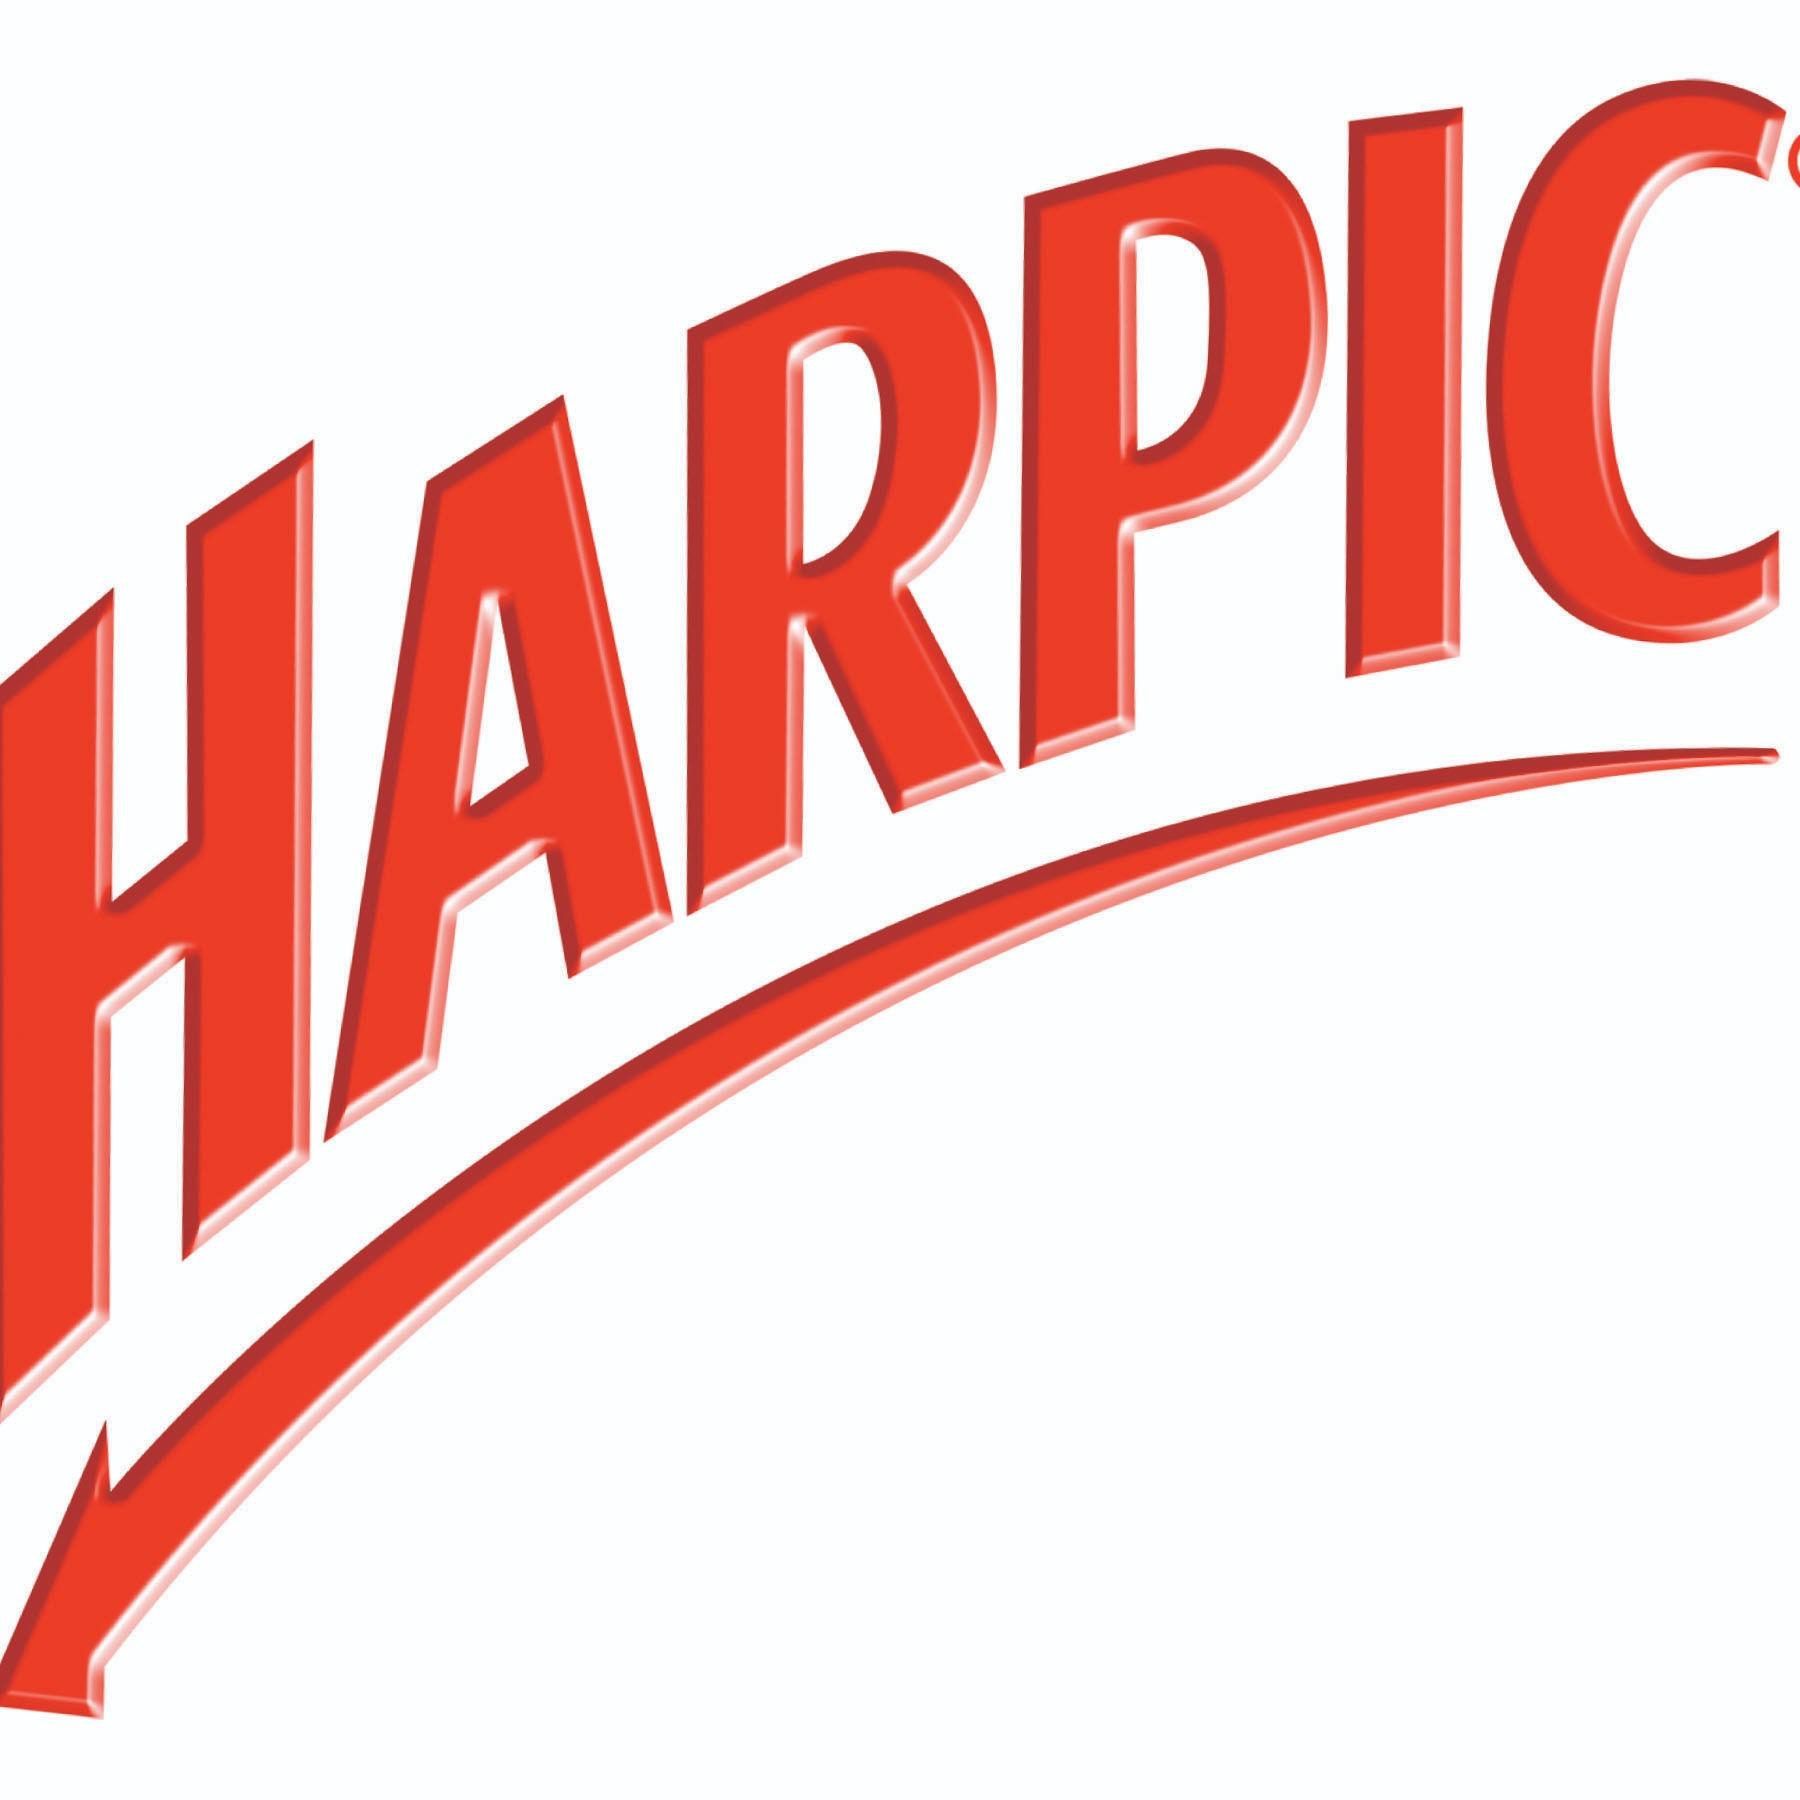 Harpic RB Pakistan